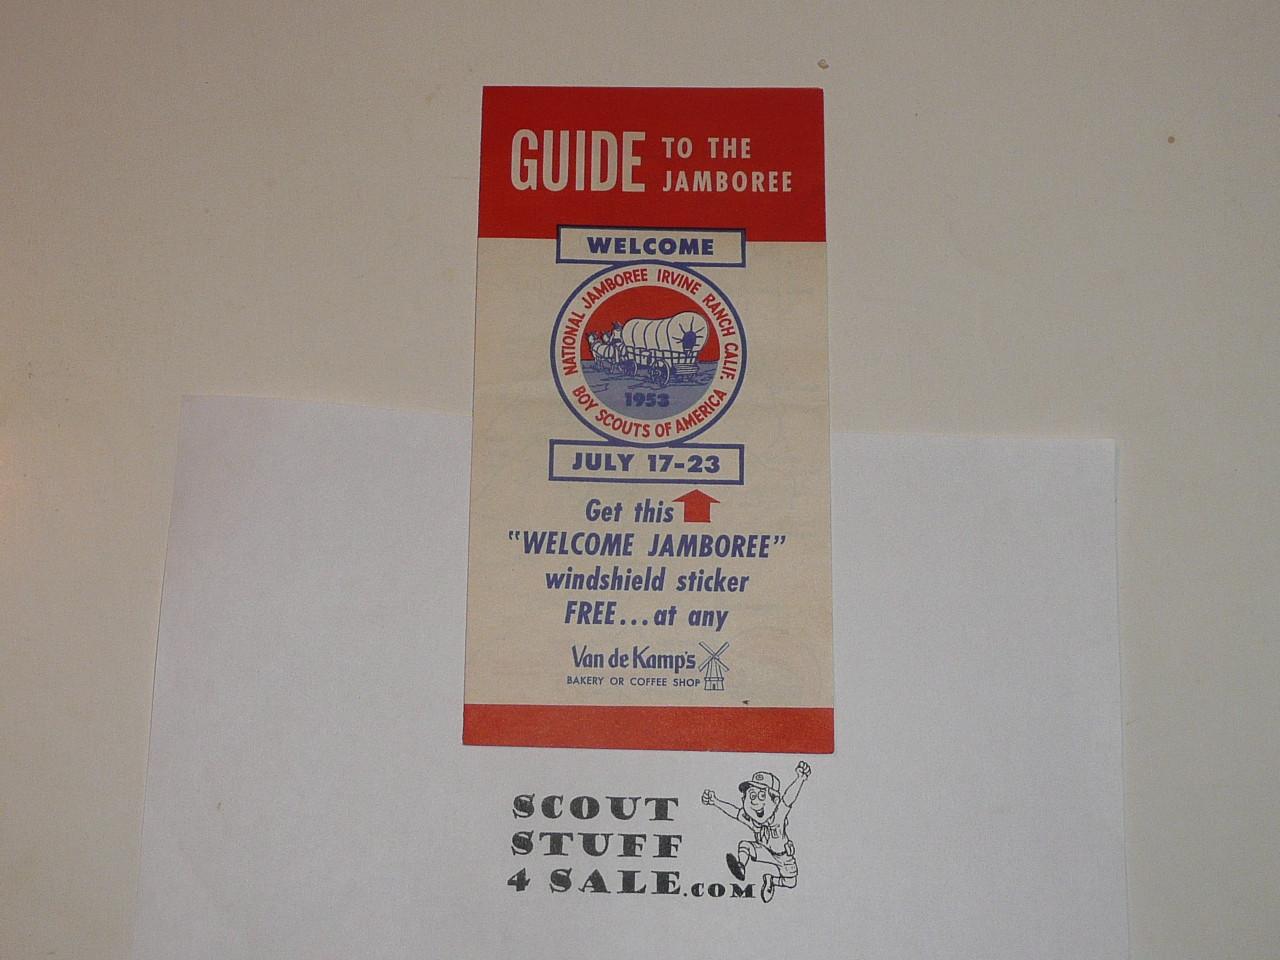 1953 National Jamboree Van de Kamps Guide to the Jamboree